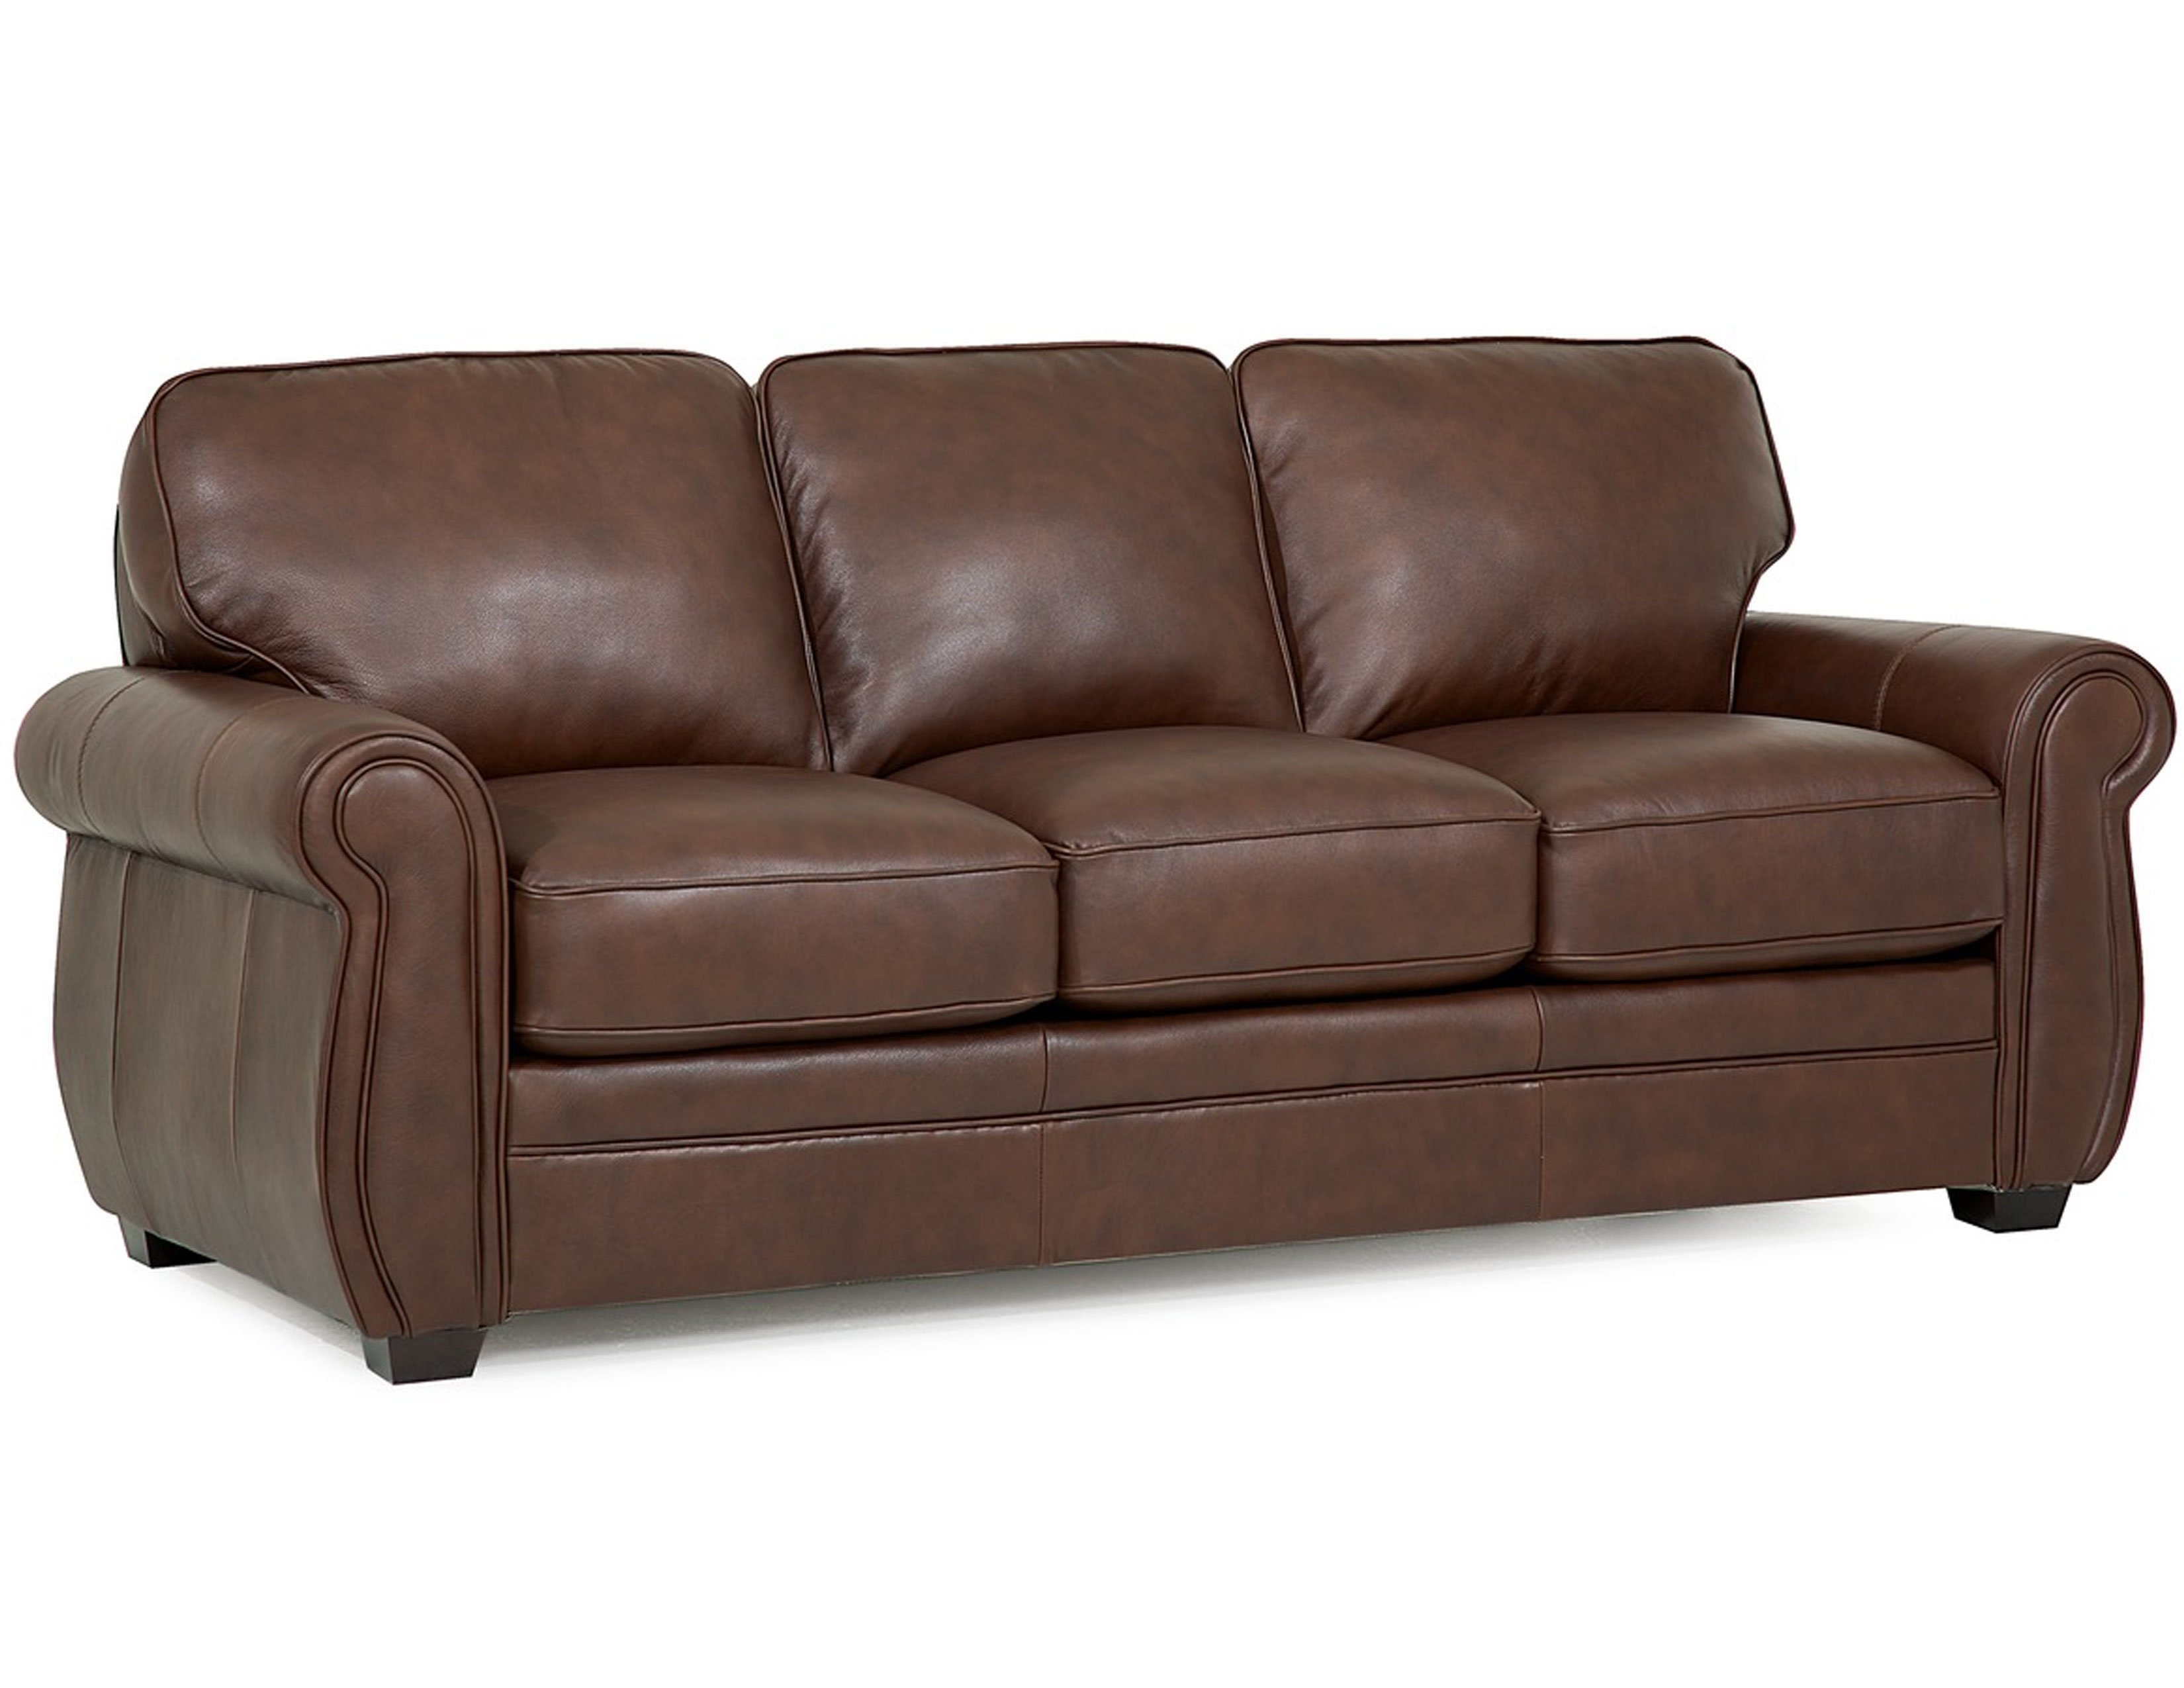 Astounding Thompson 77792 Leather Sofa 100 Leathers Sofas And Ibusinesslaw Wood Chair Design Ideas Ibusinesslaworg